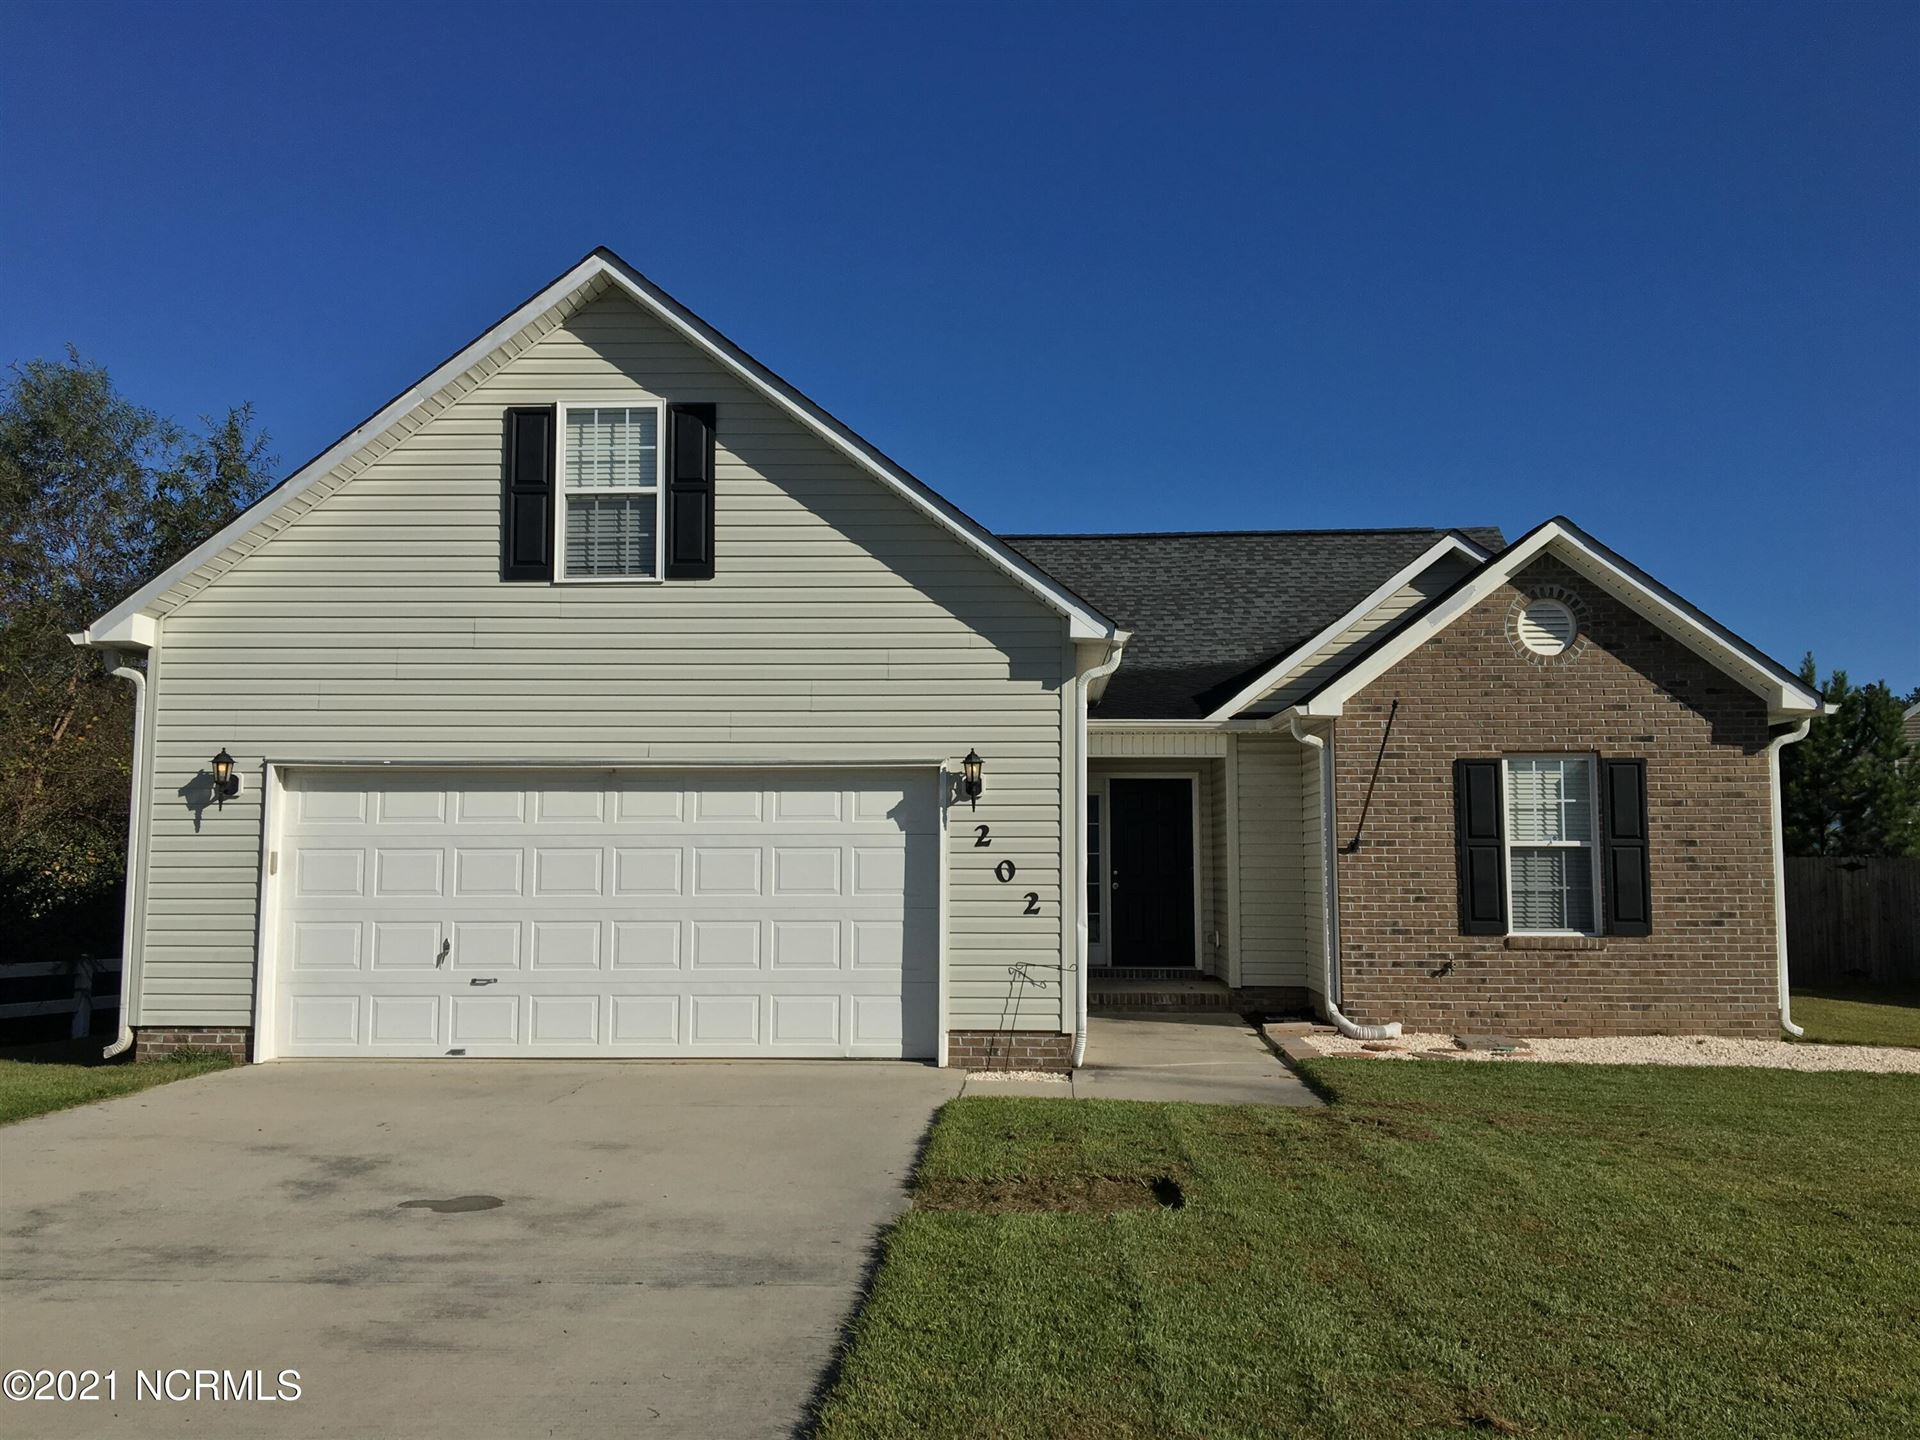 Photo of 202 Brunswick Drive, Jacksonville, NC 28546 (MLS # 100277750)